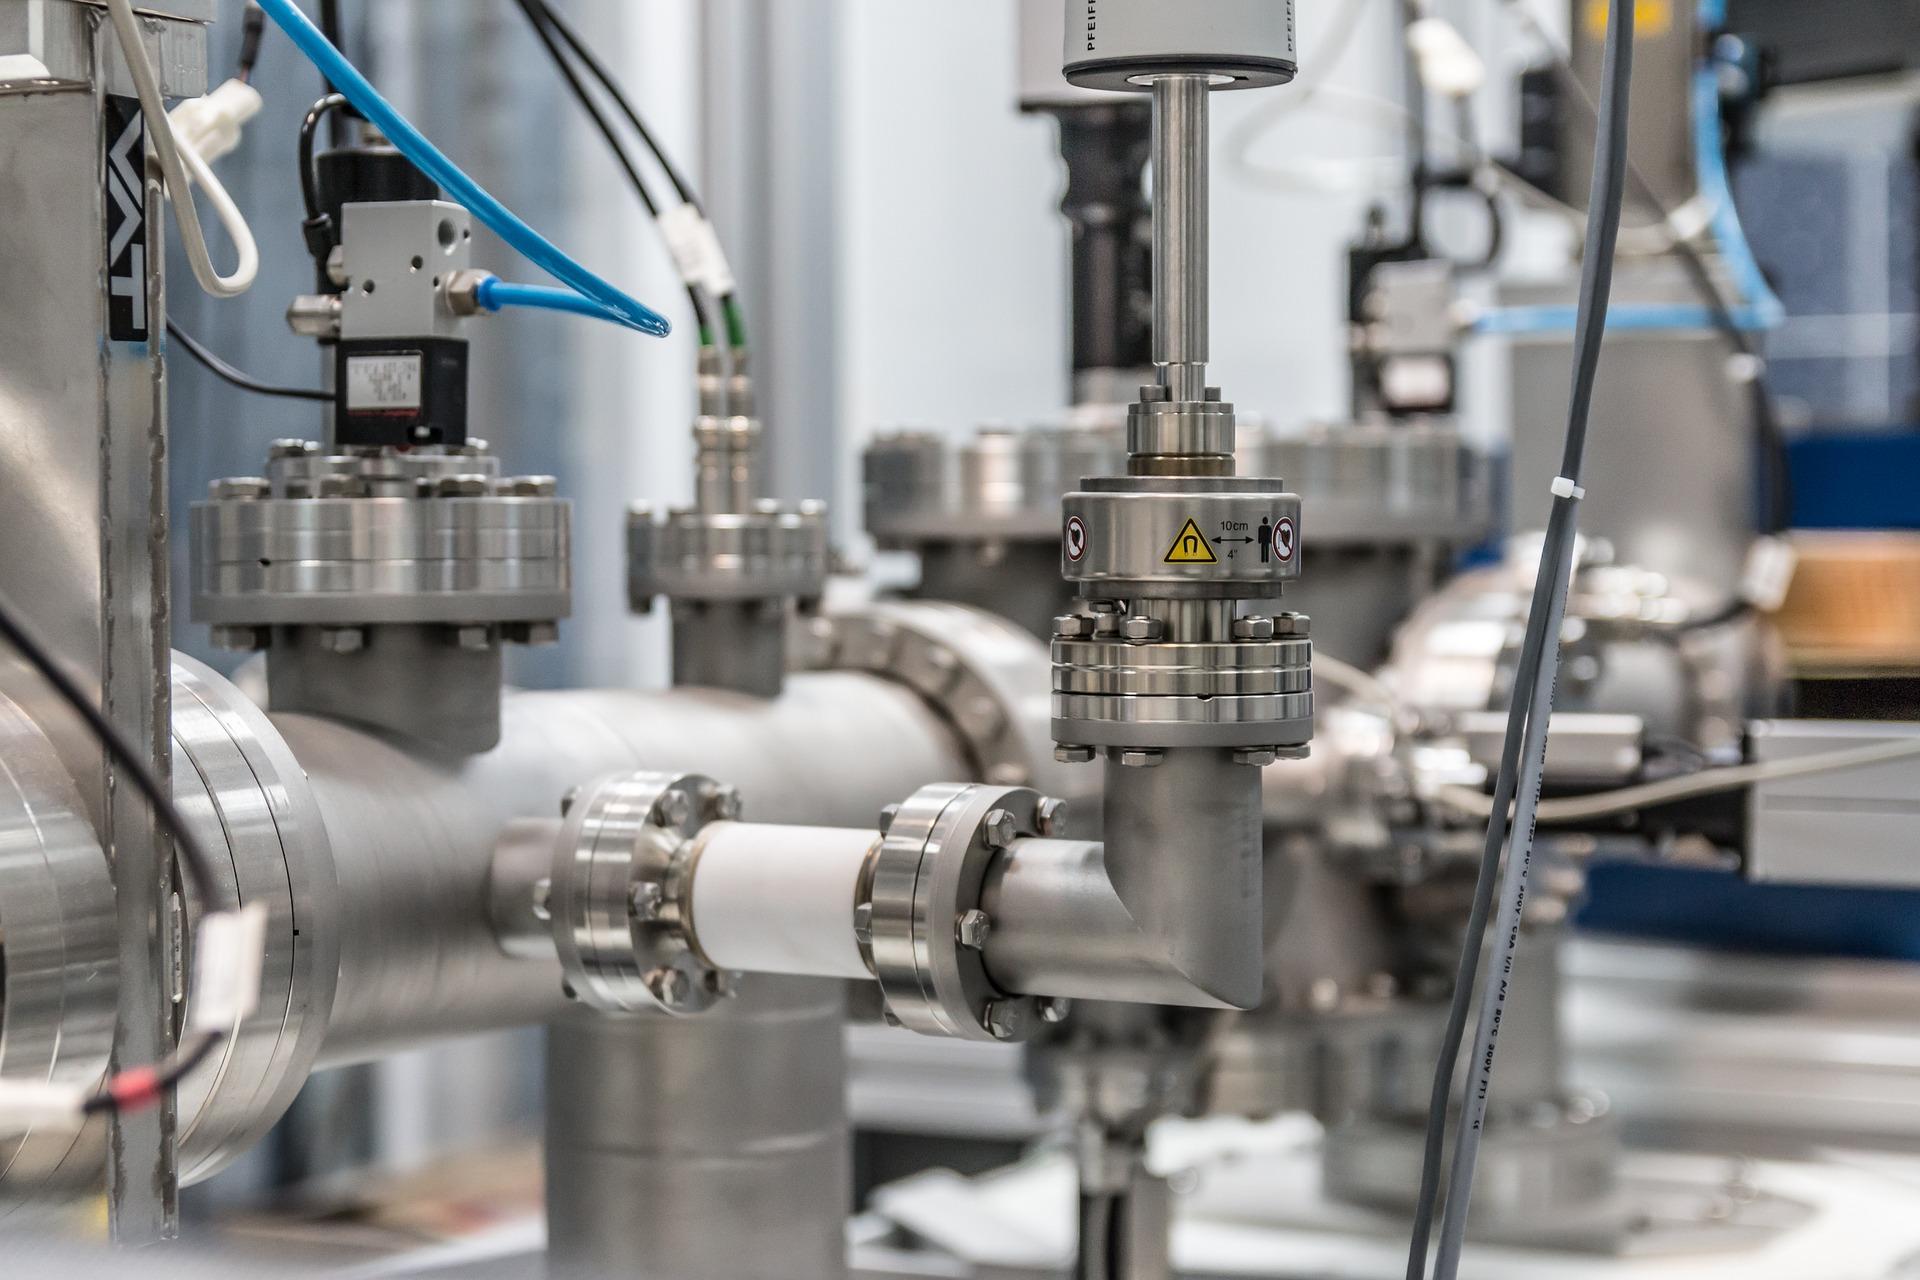 Serviços para águas industriais da VIPUR